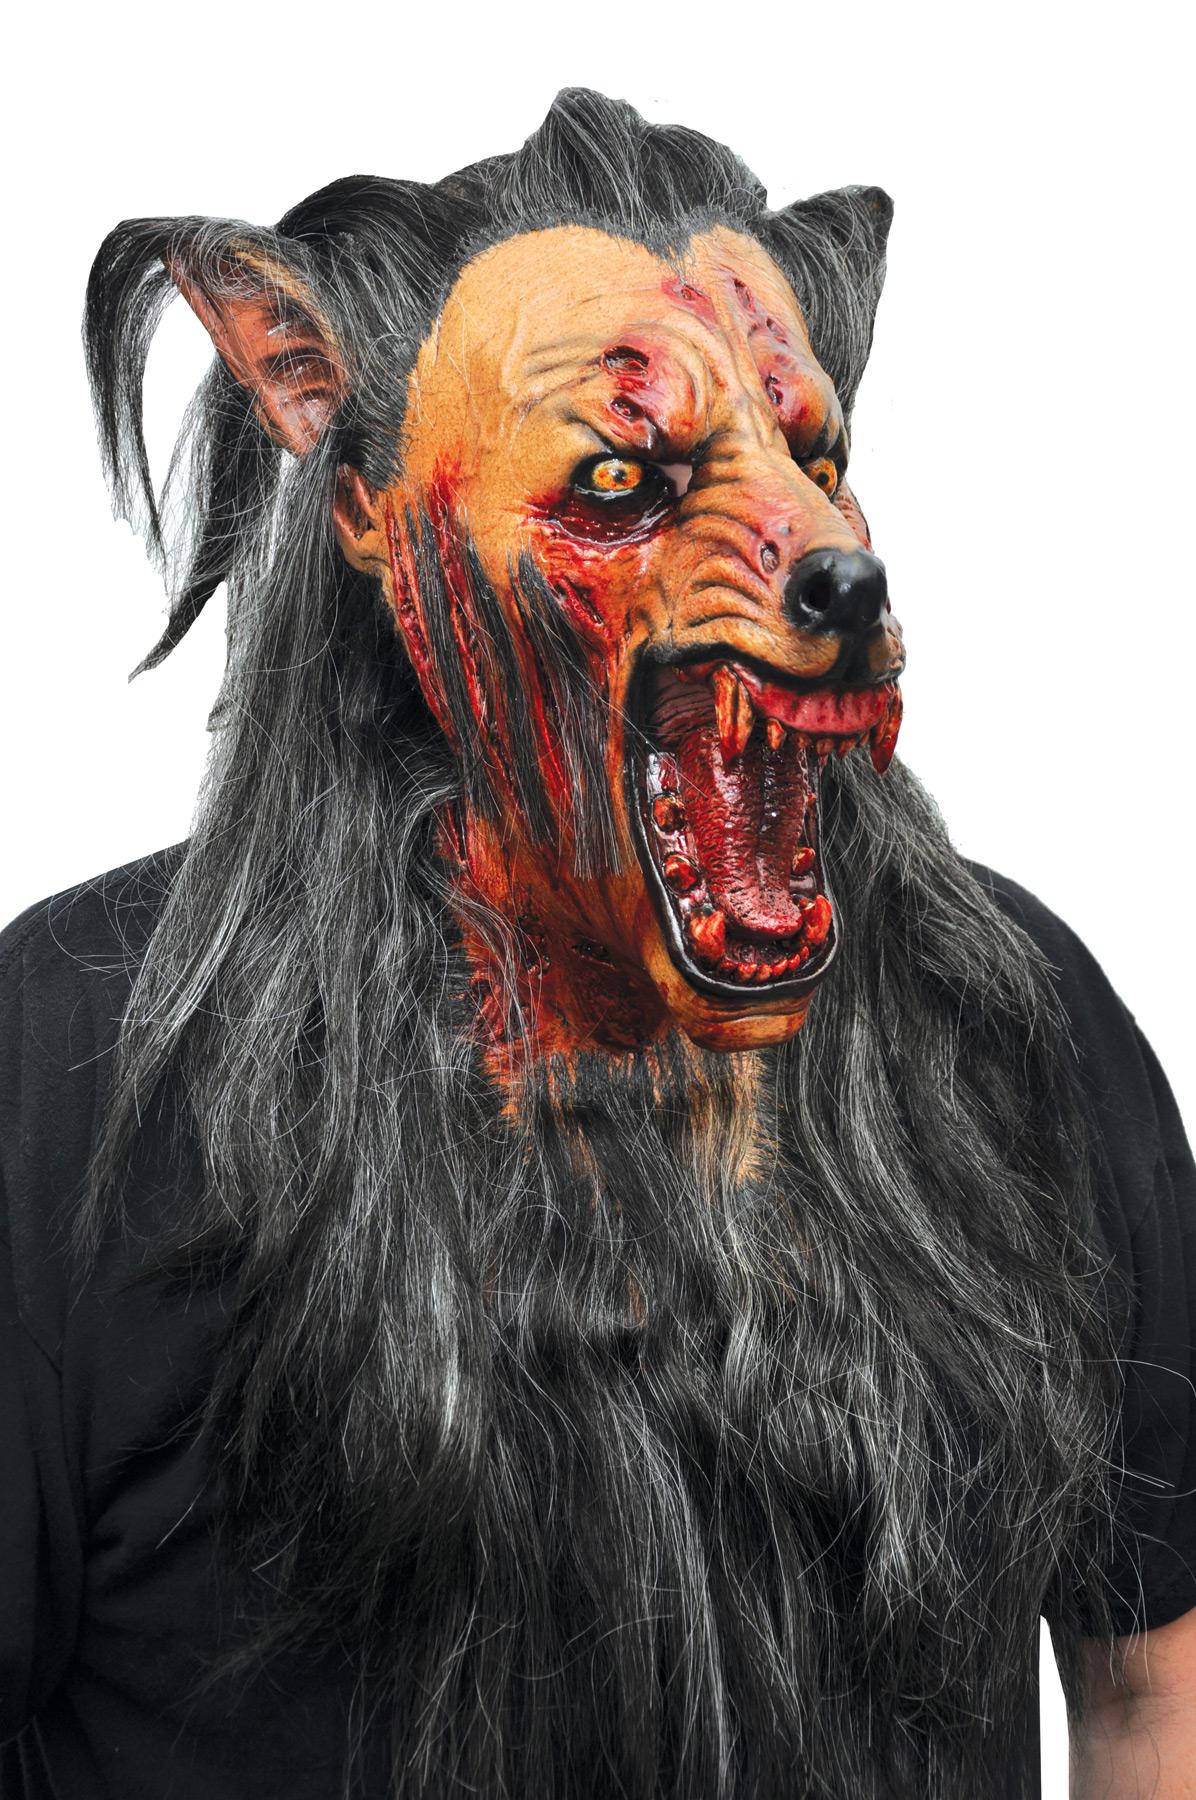 https://www.costumepub.com/images/product/large/MC-tb26337.jpg